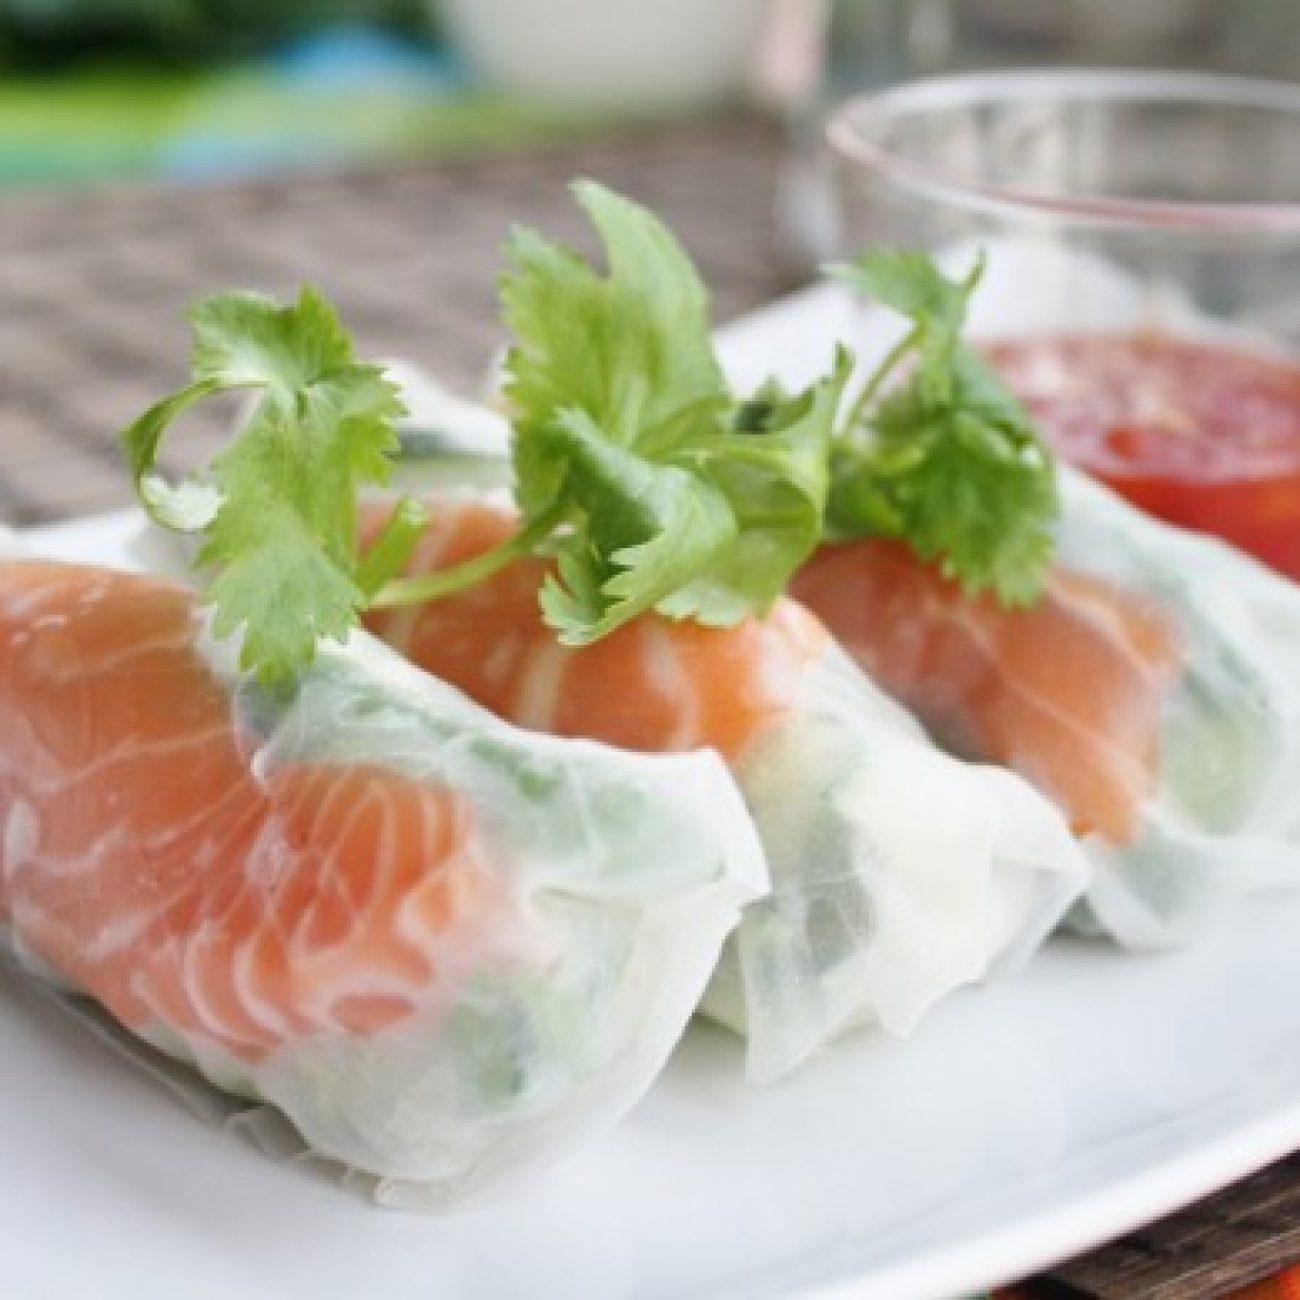 Salad Rolls With Thai Sweet Chili Sauce